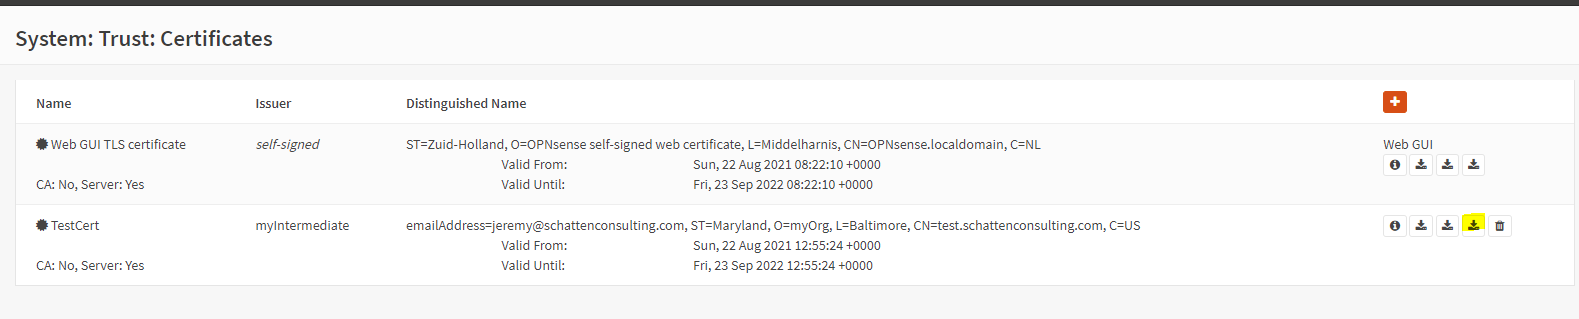 OPNSense Trust Certificates